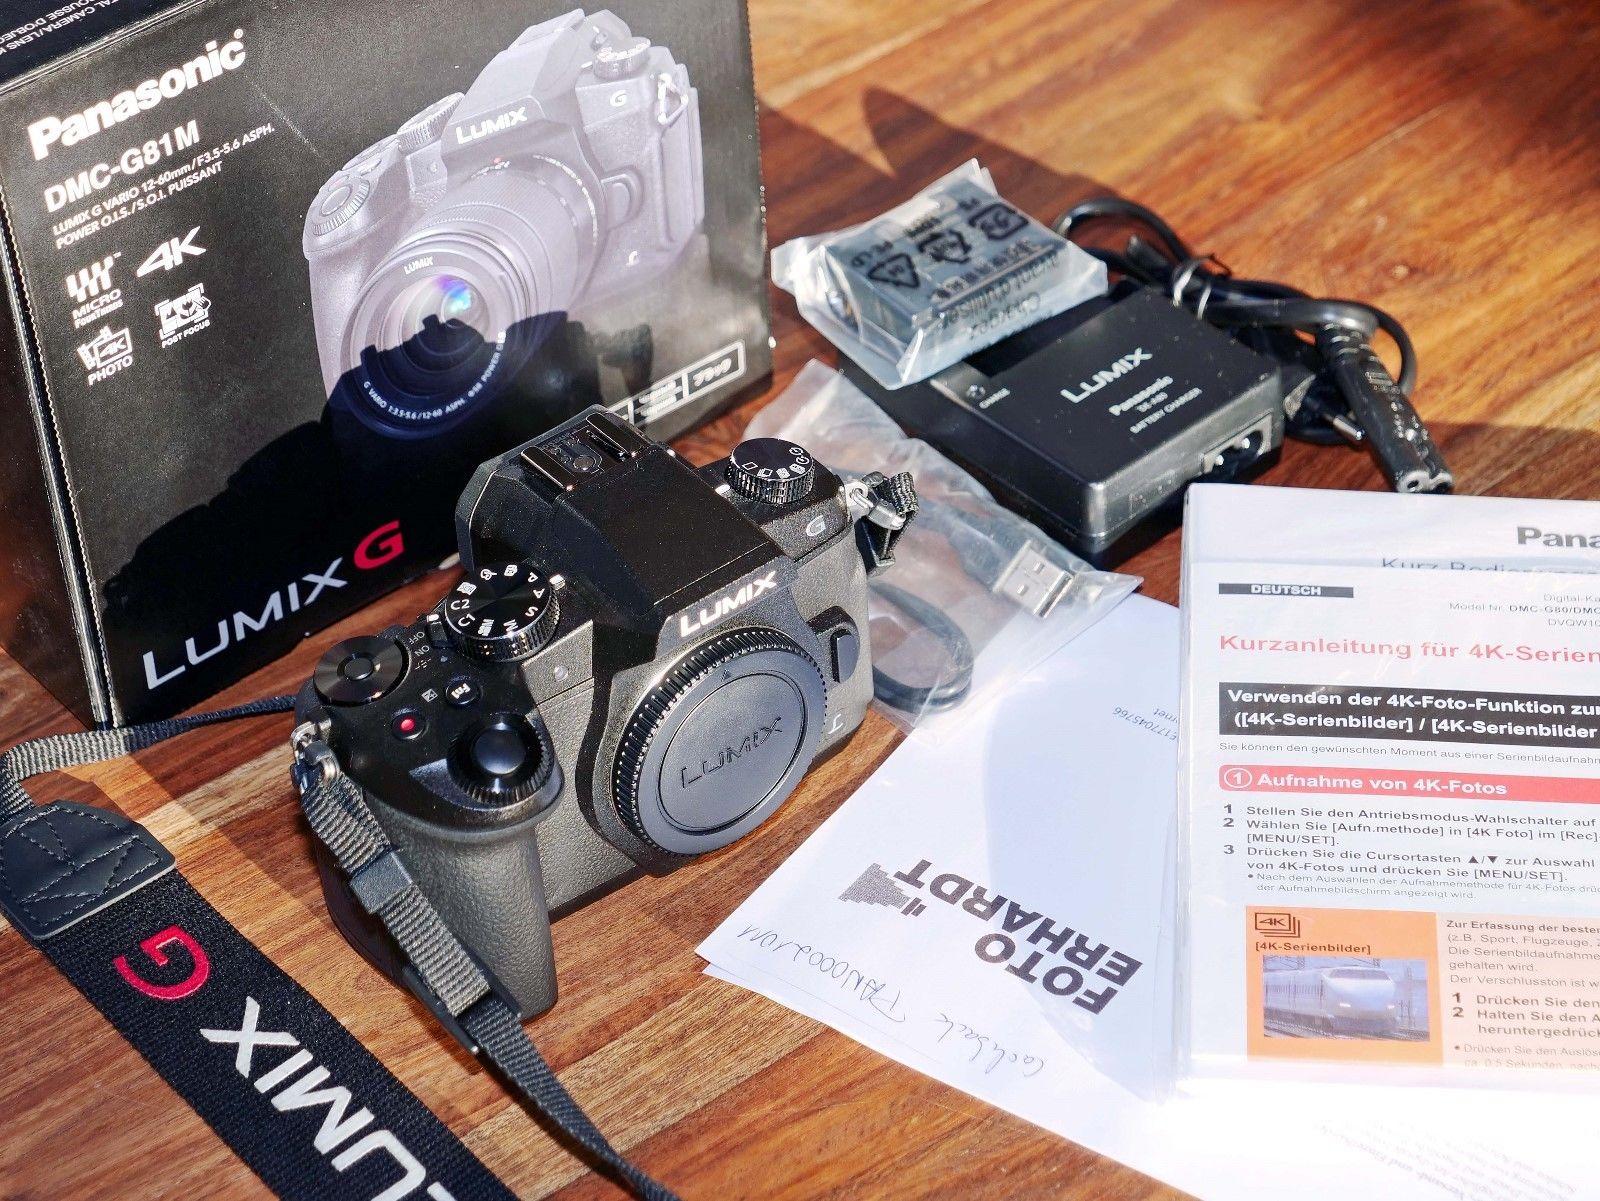 Swarovski Entfernungsmesser Xxl : Panasonic lumix dmc g81